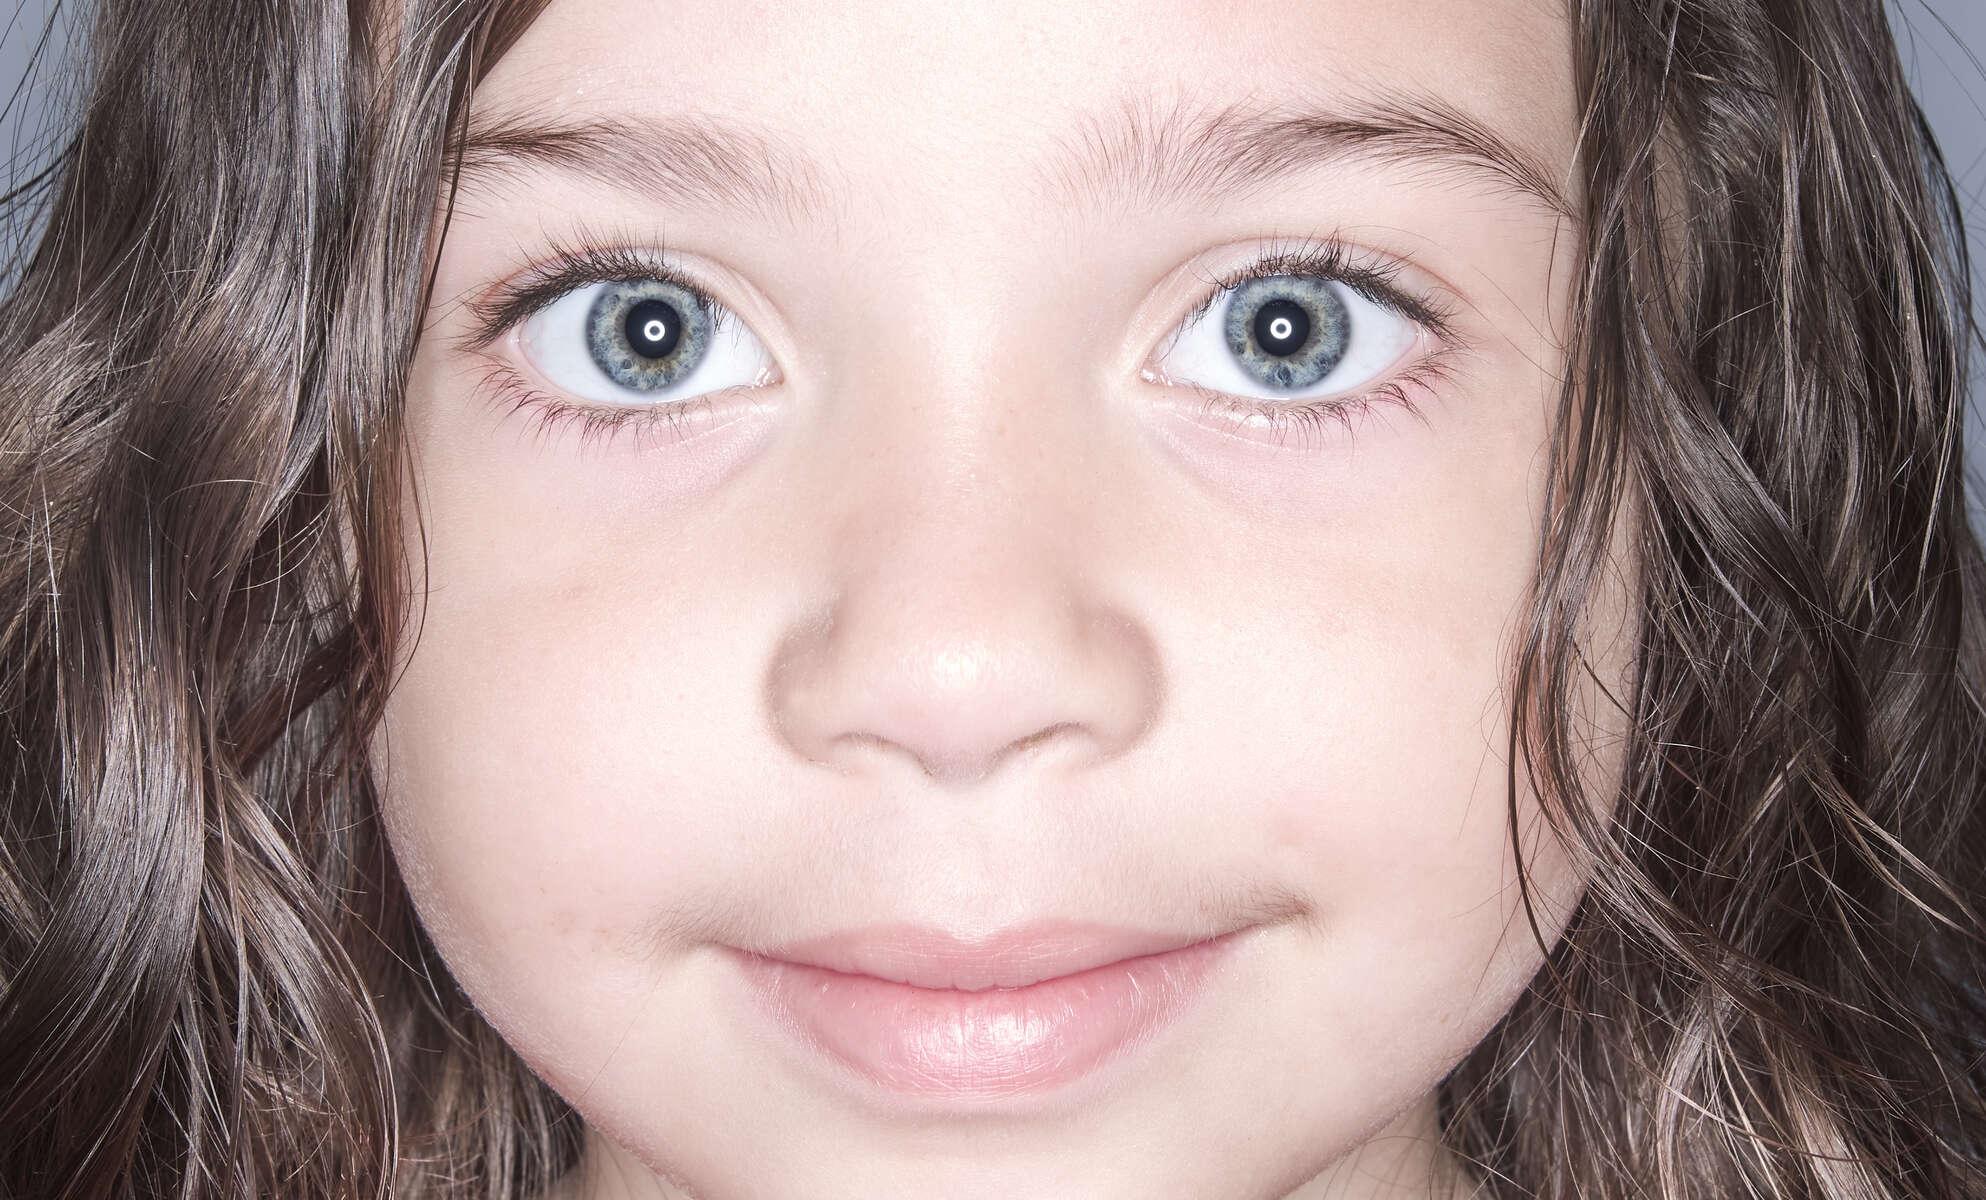 Bright eyes!  Roughhousing!  Boisterous play!